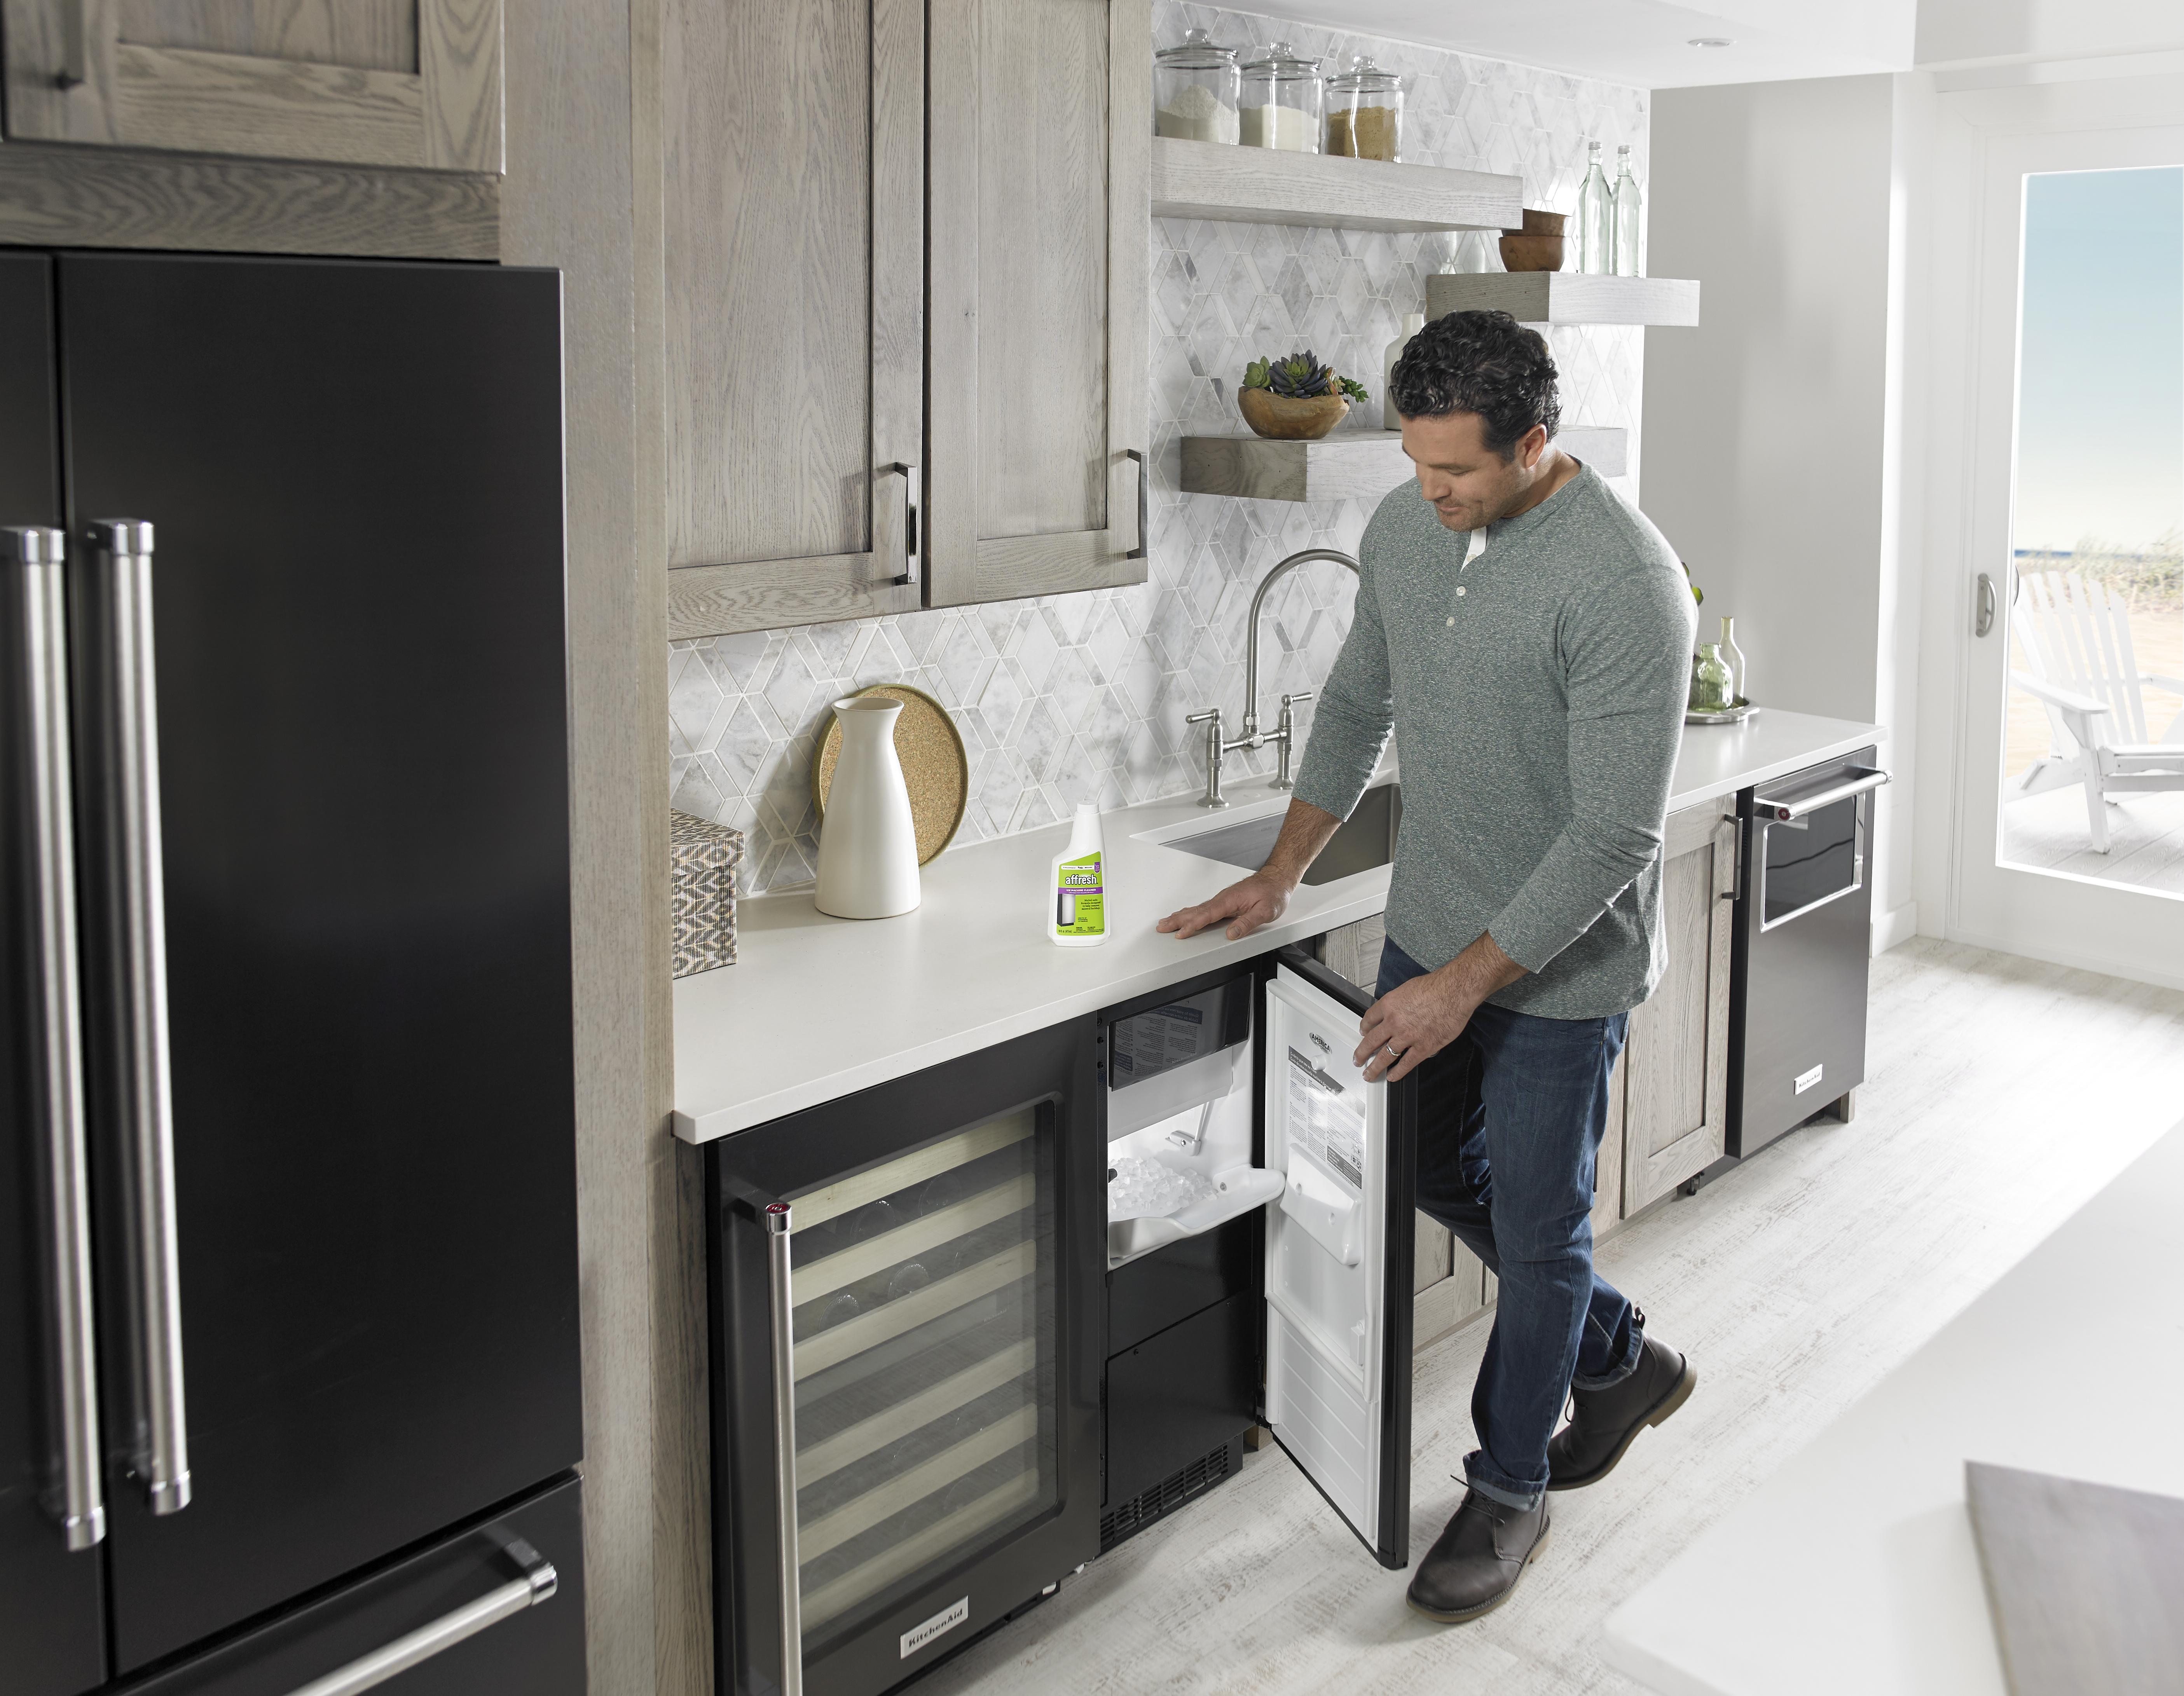 Ice Machine Cleaner Lifestyle 1